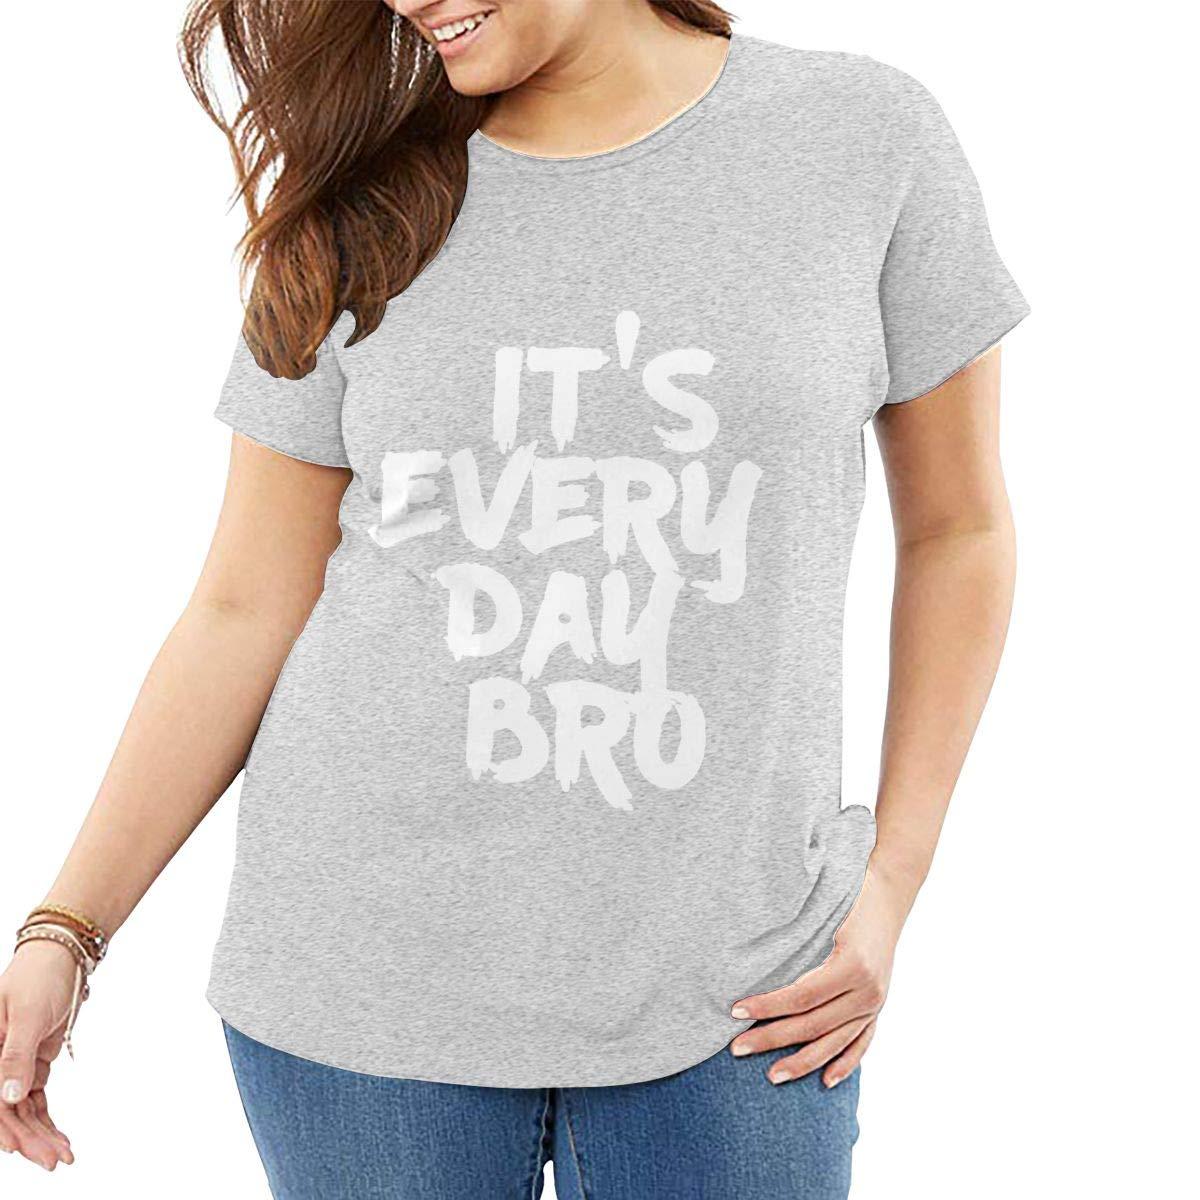 Fat Women's T Shirt Jake Paul It's Every Day BRO Tee Shirts T-Shirt Short-Sleeve Round Neck Tshirt for Women Girls Gray 3XL by BKashy